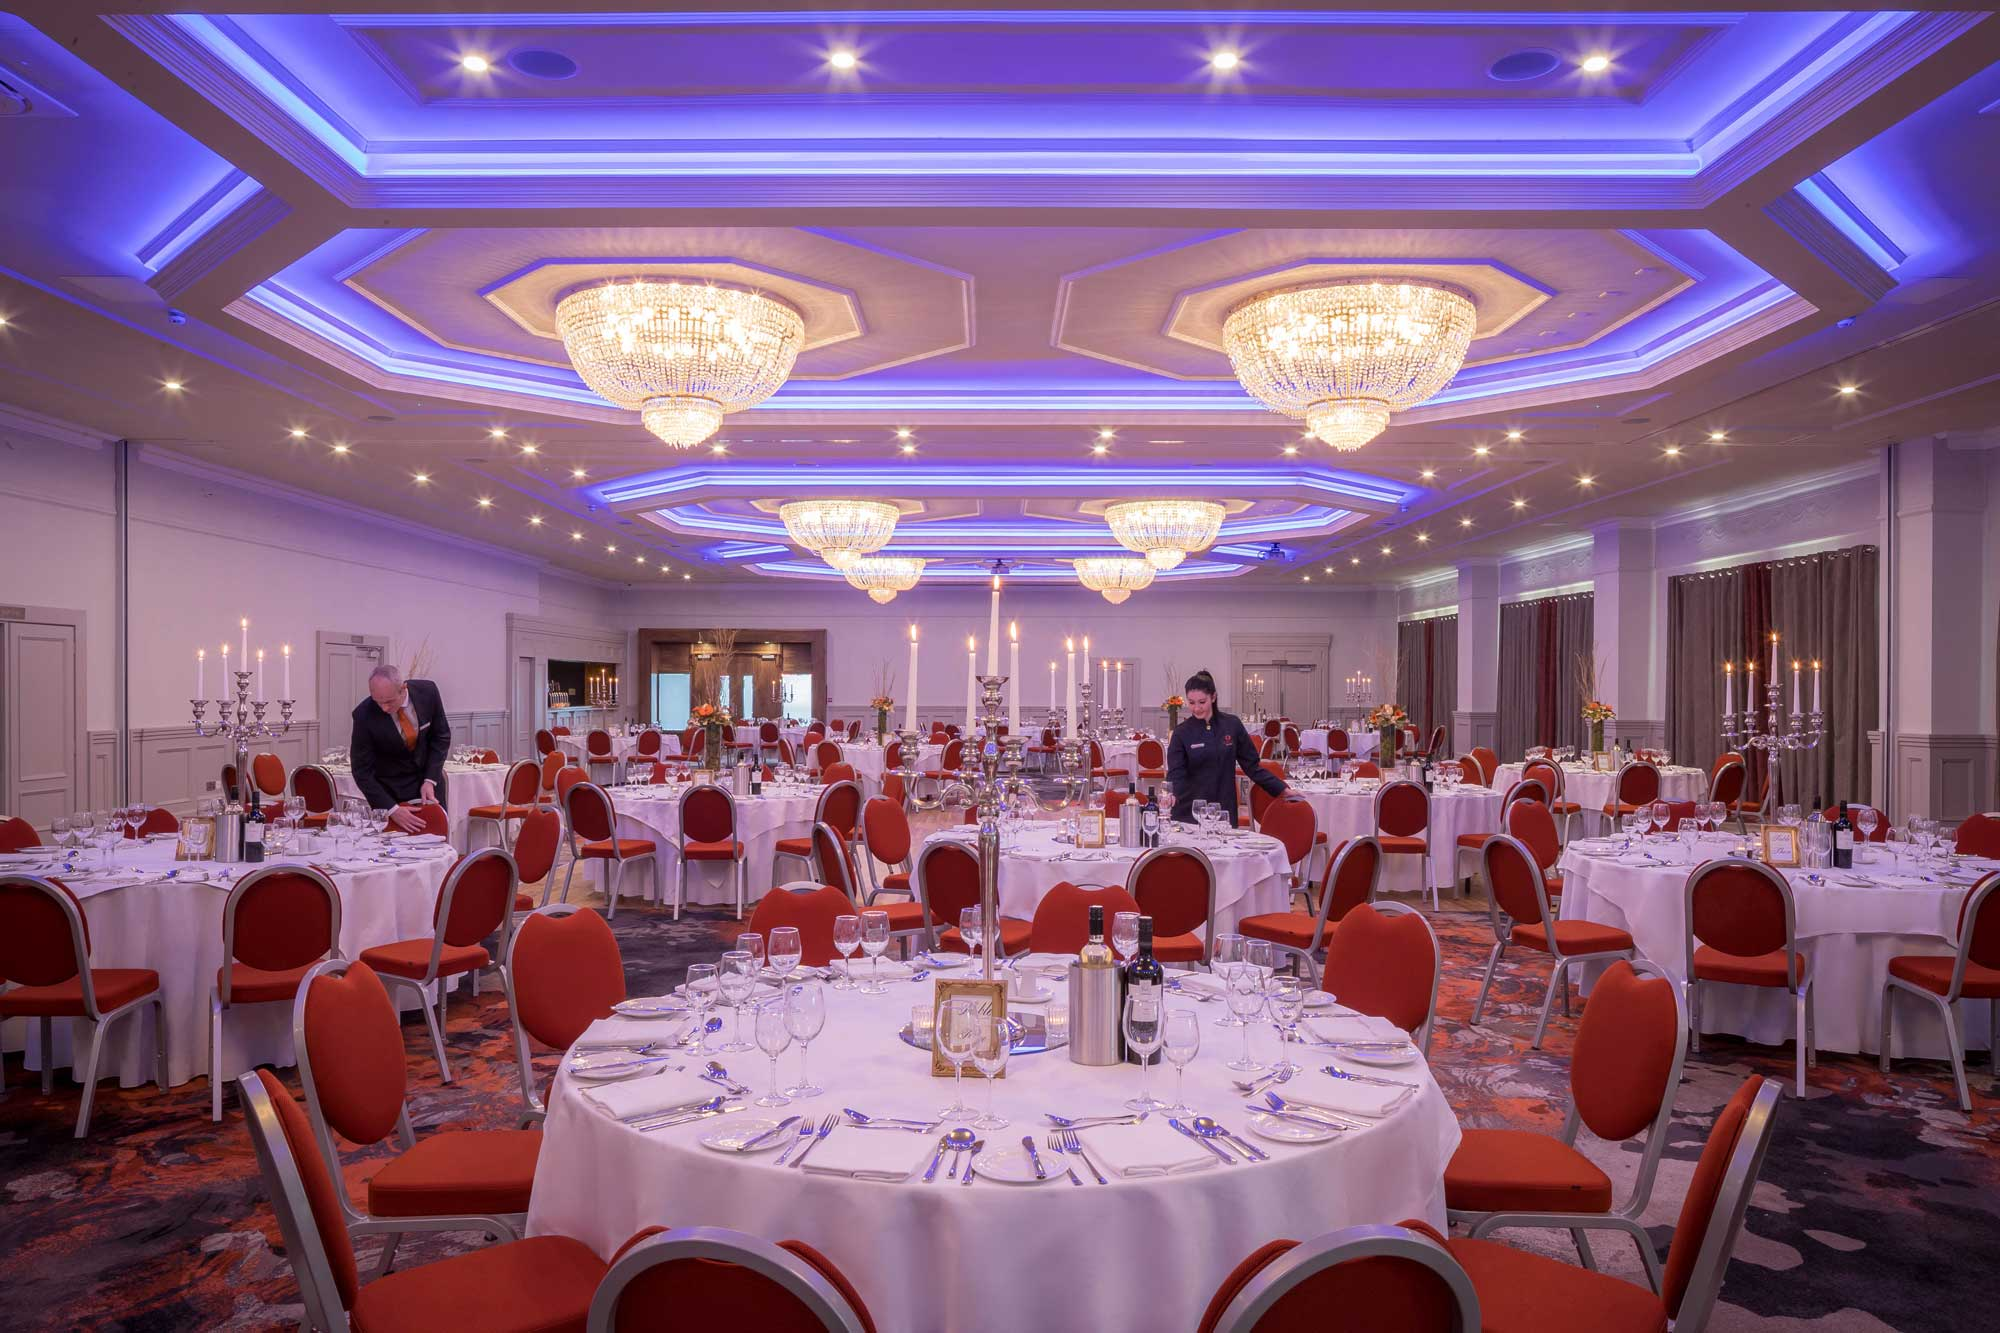 gala-dinner-banquet-Clayton-Hotel-Silver-Springs-Cork